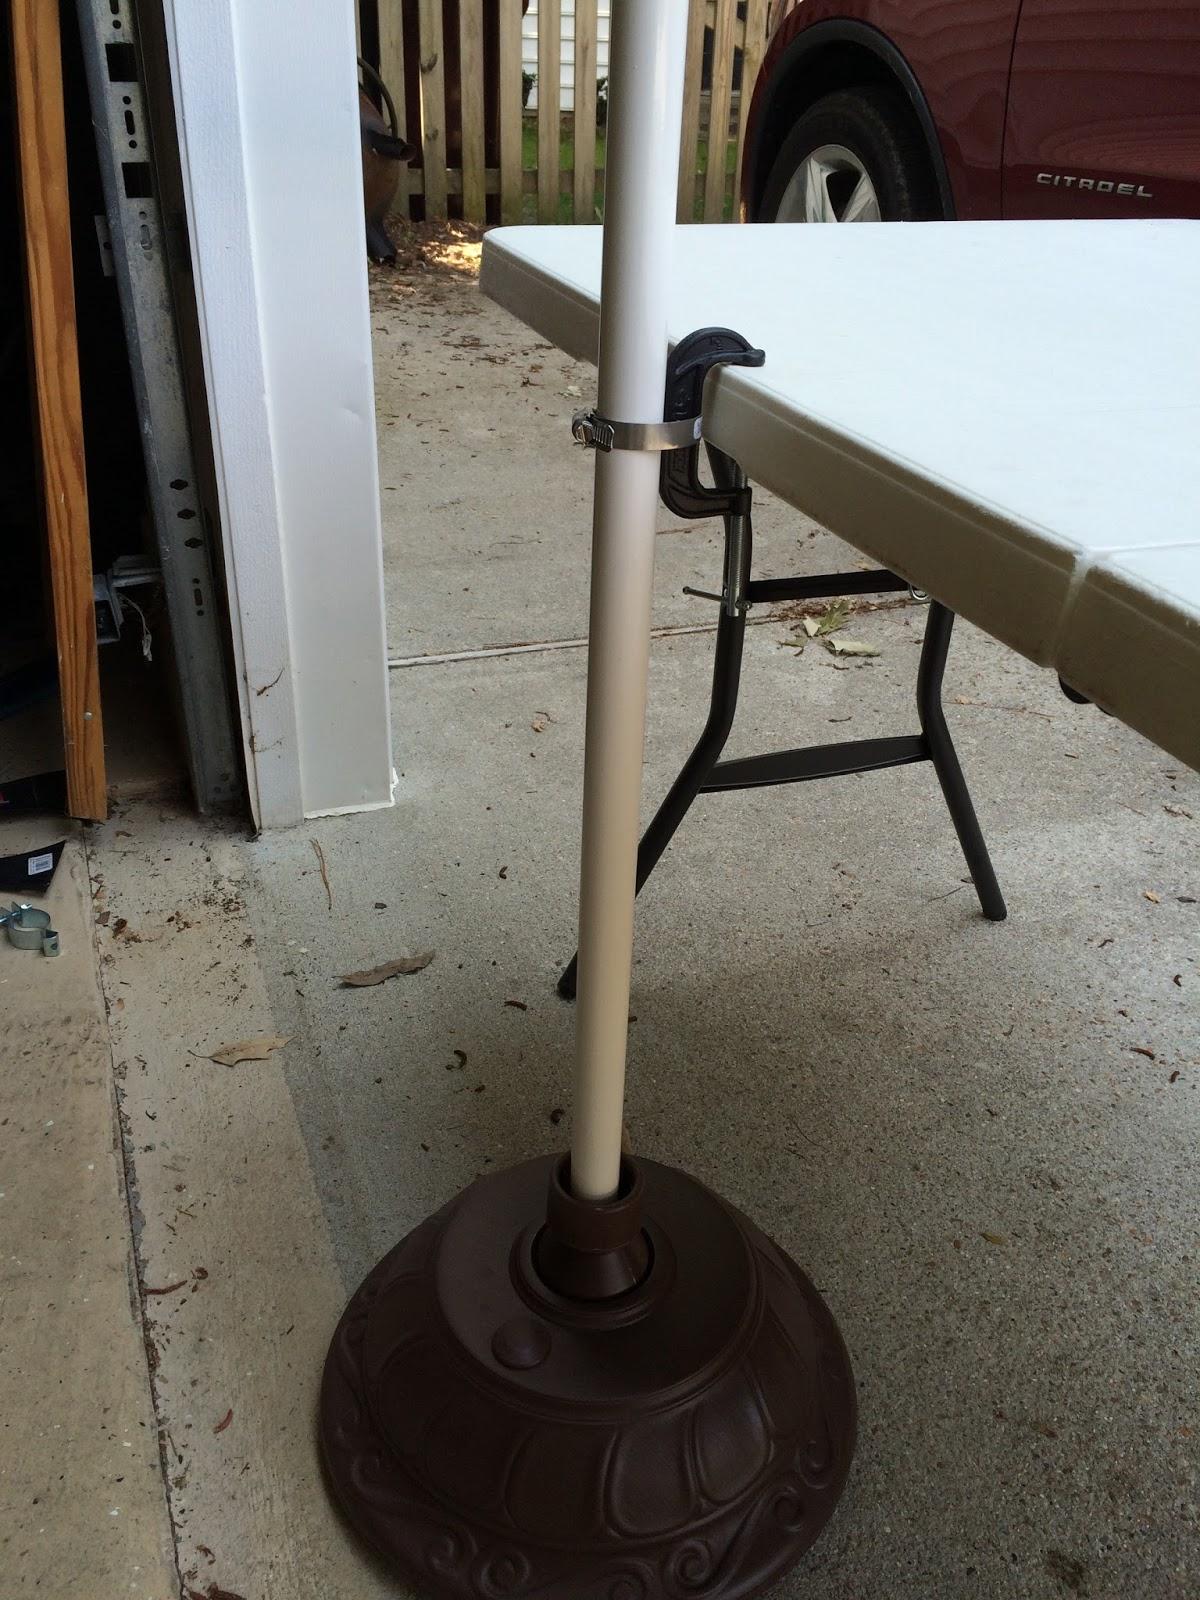 Securing A Market Umbrella At An Outdoor Craft Show